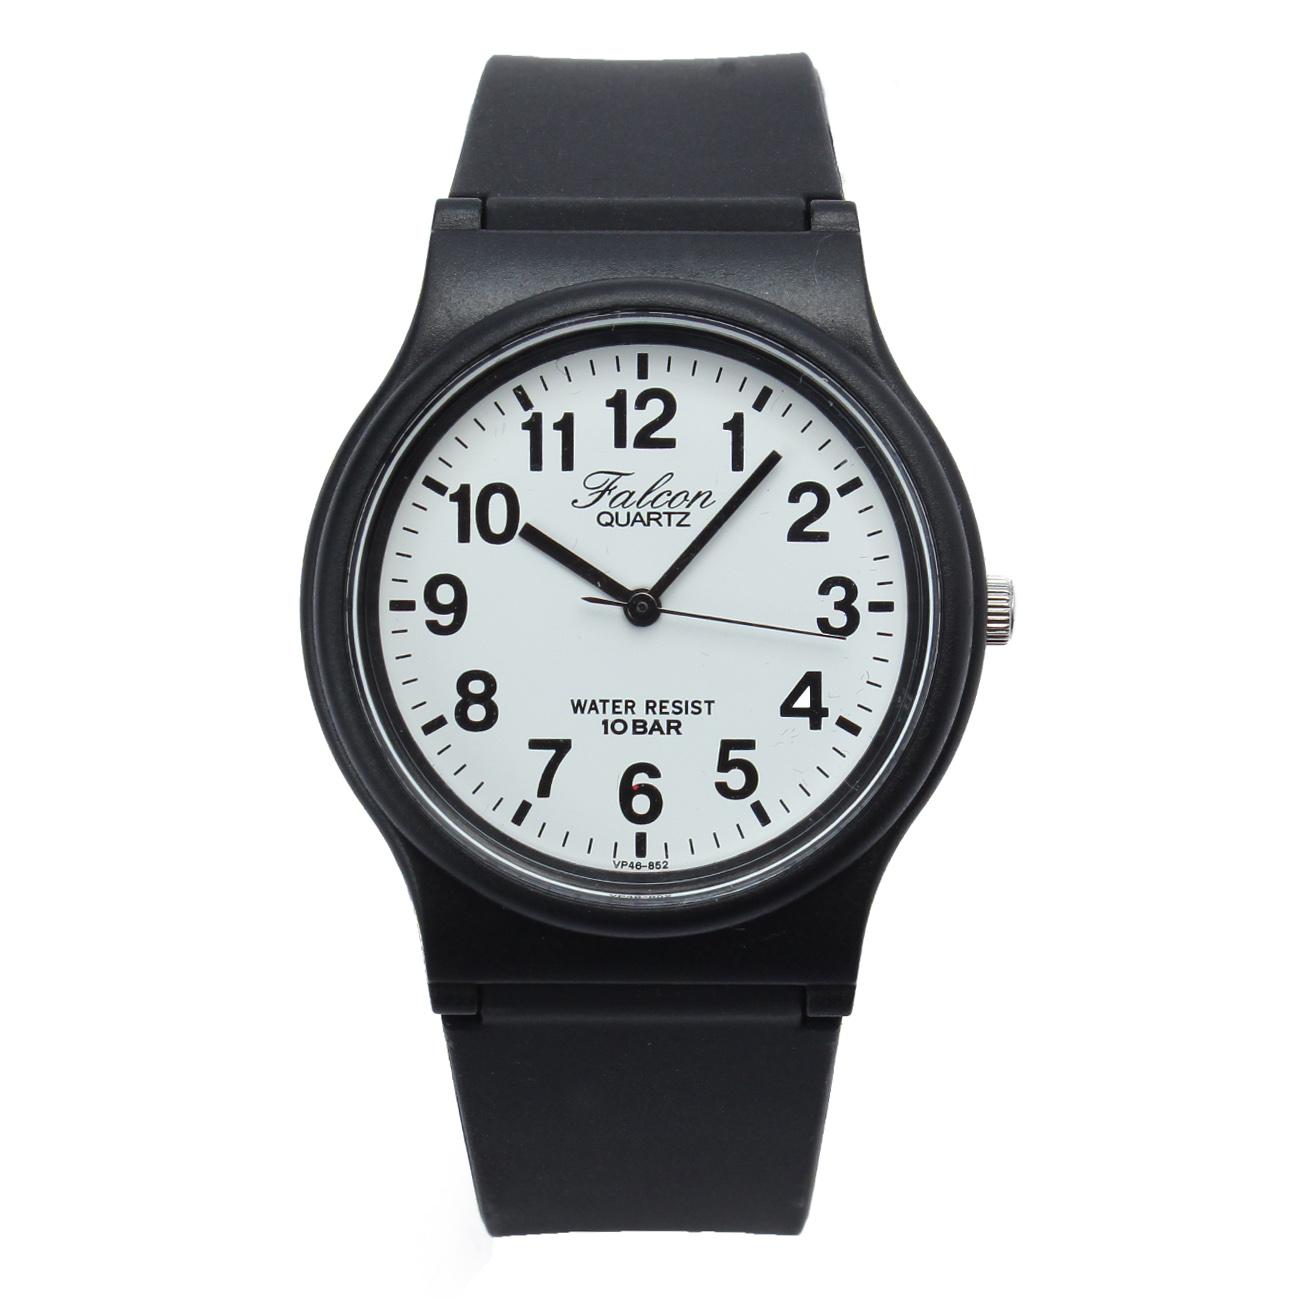 【grove (グローブ)】【WEB限定】Q&Qプラスチックバンド腕時計レディース 雑貨|腕時計 ブラック